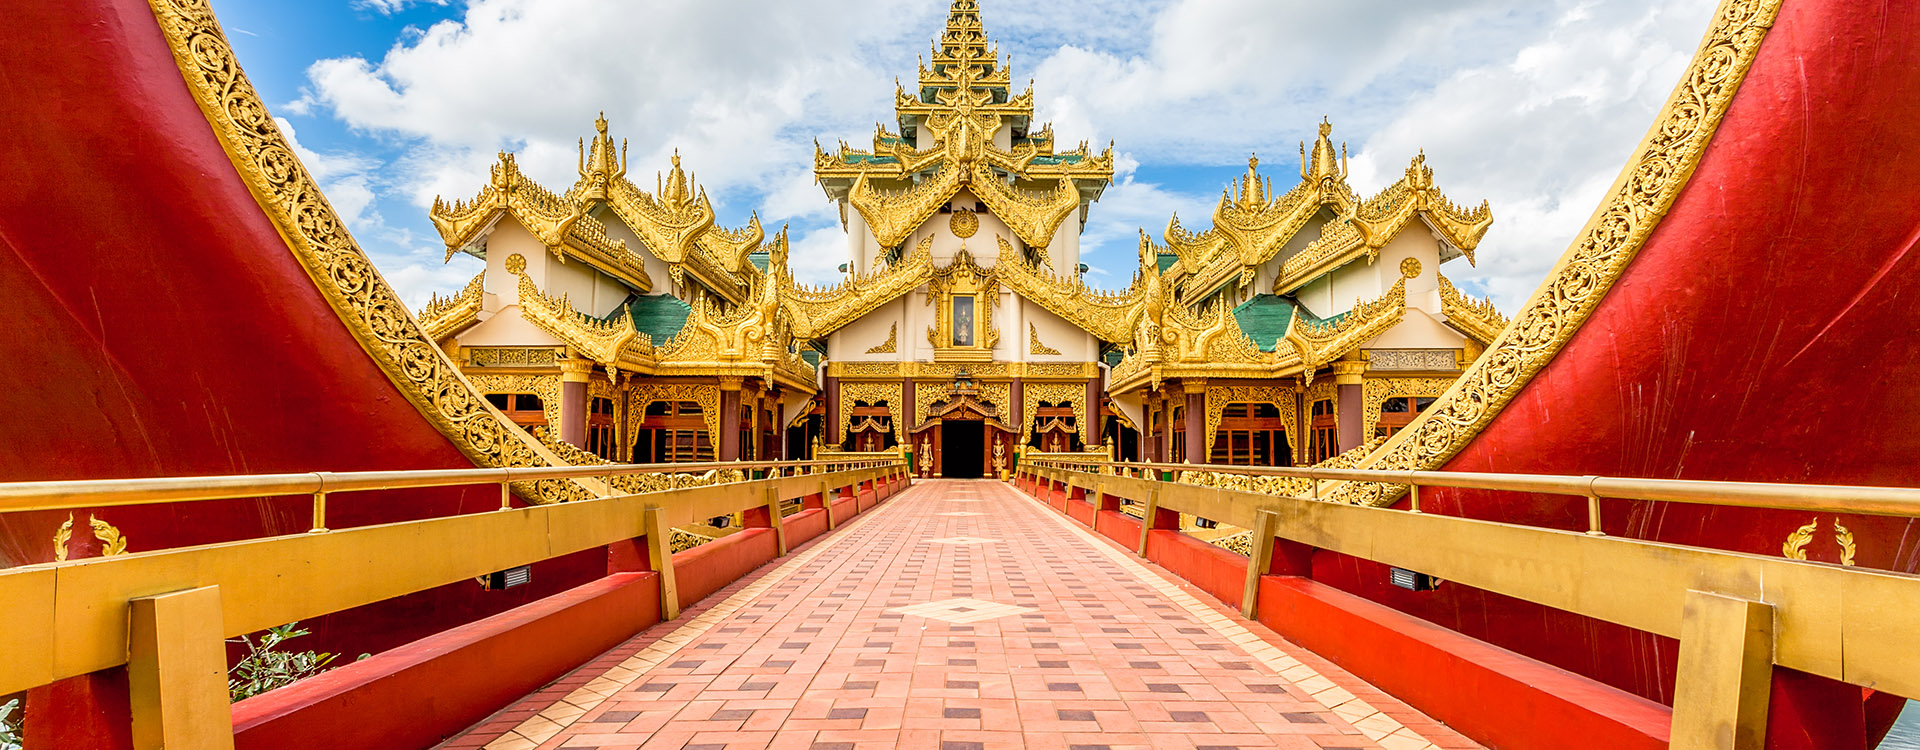 Karaweik palace entrance walkway in Yangon, Myanmar